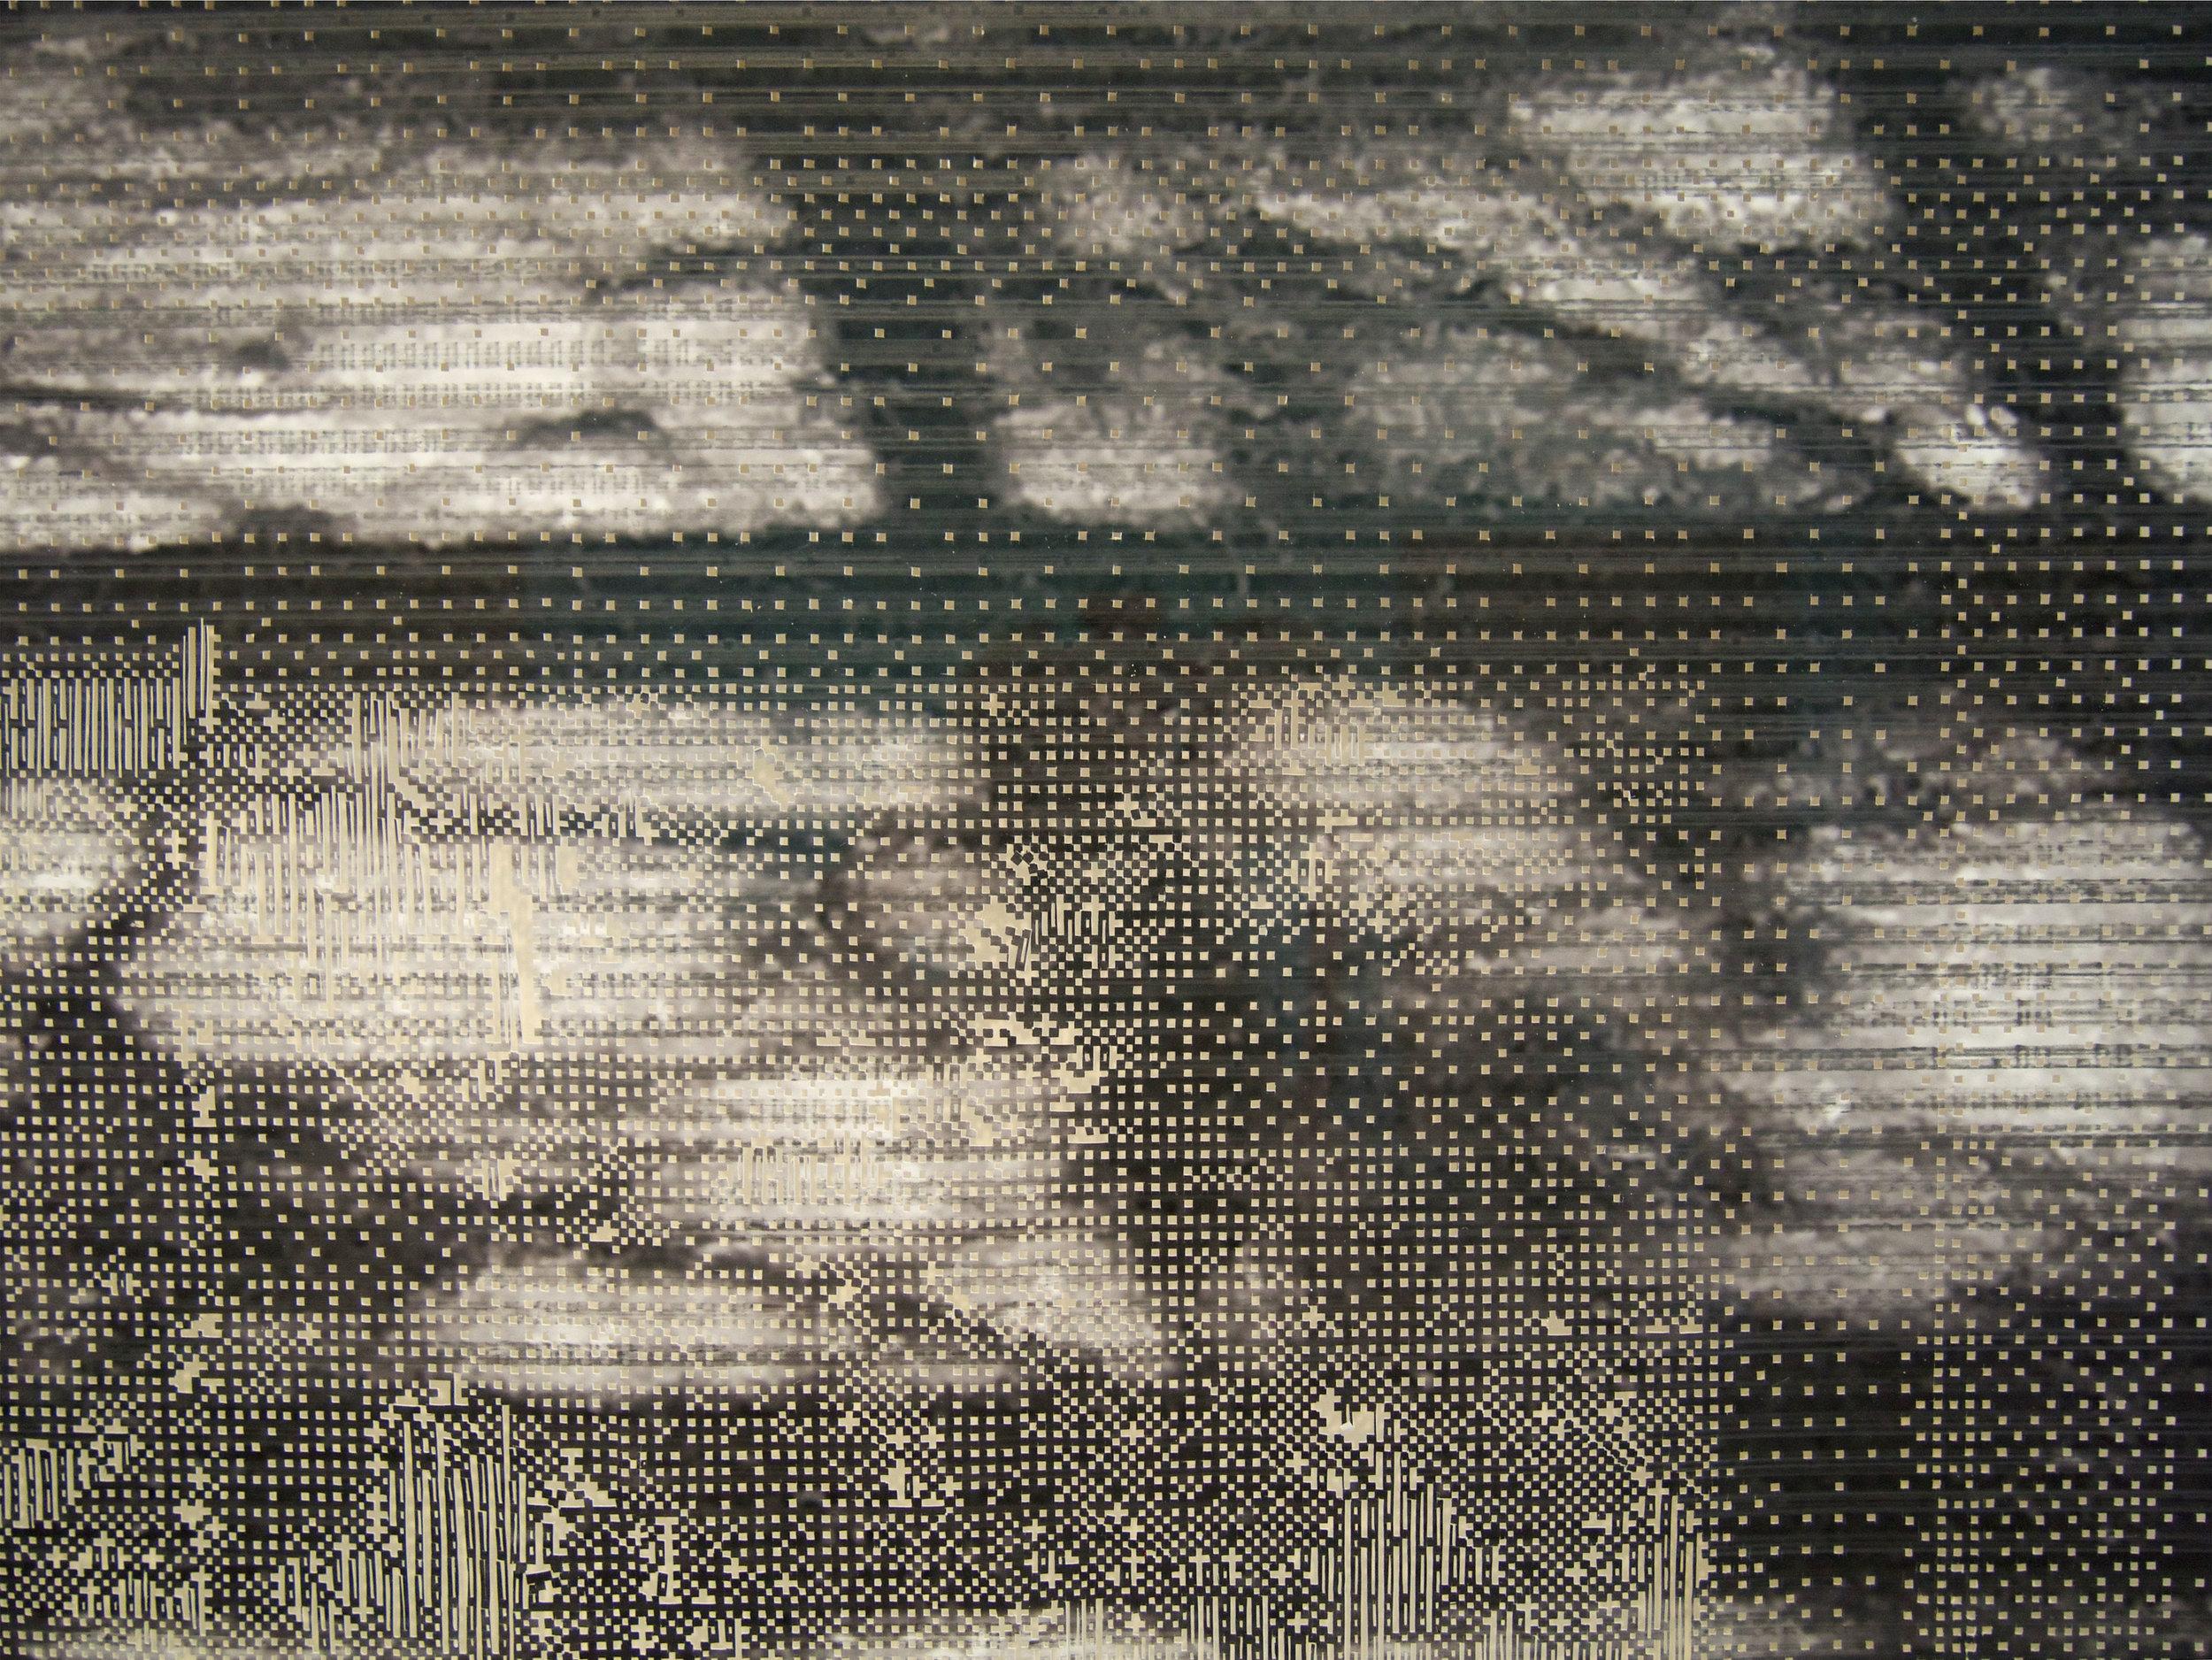 Virtual Window (detail)